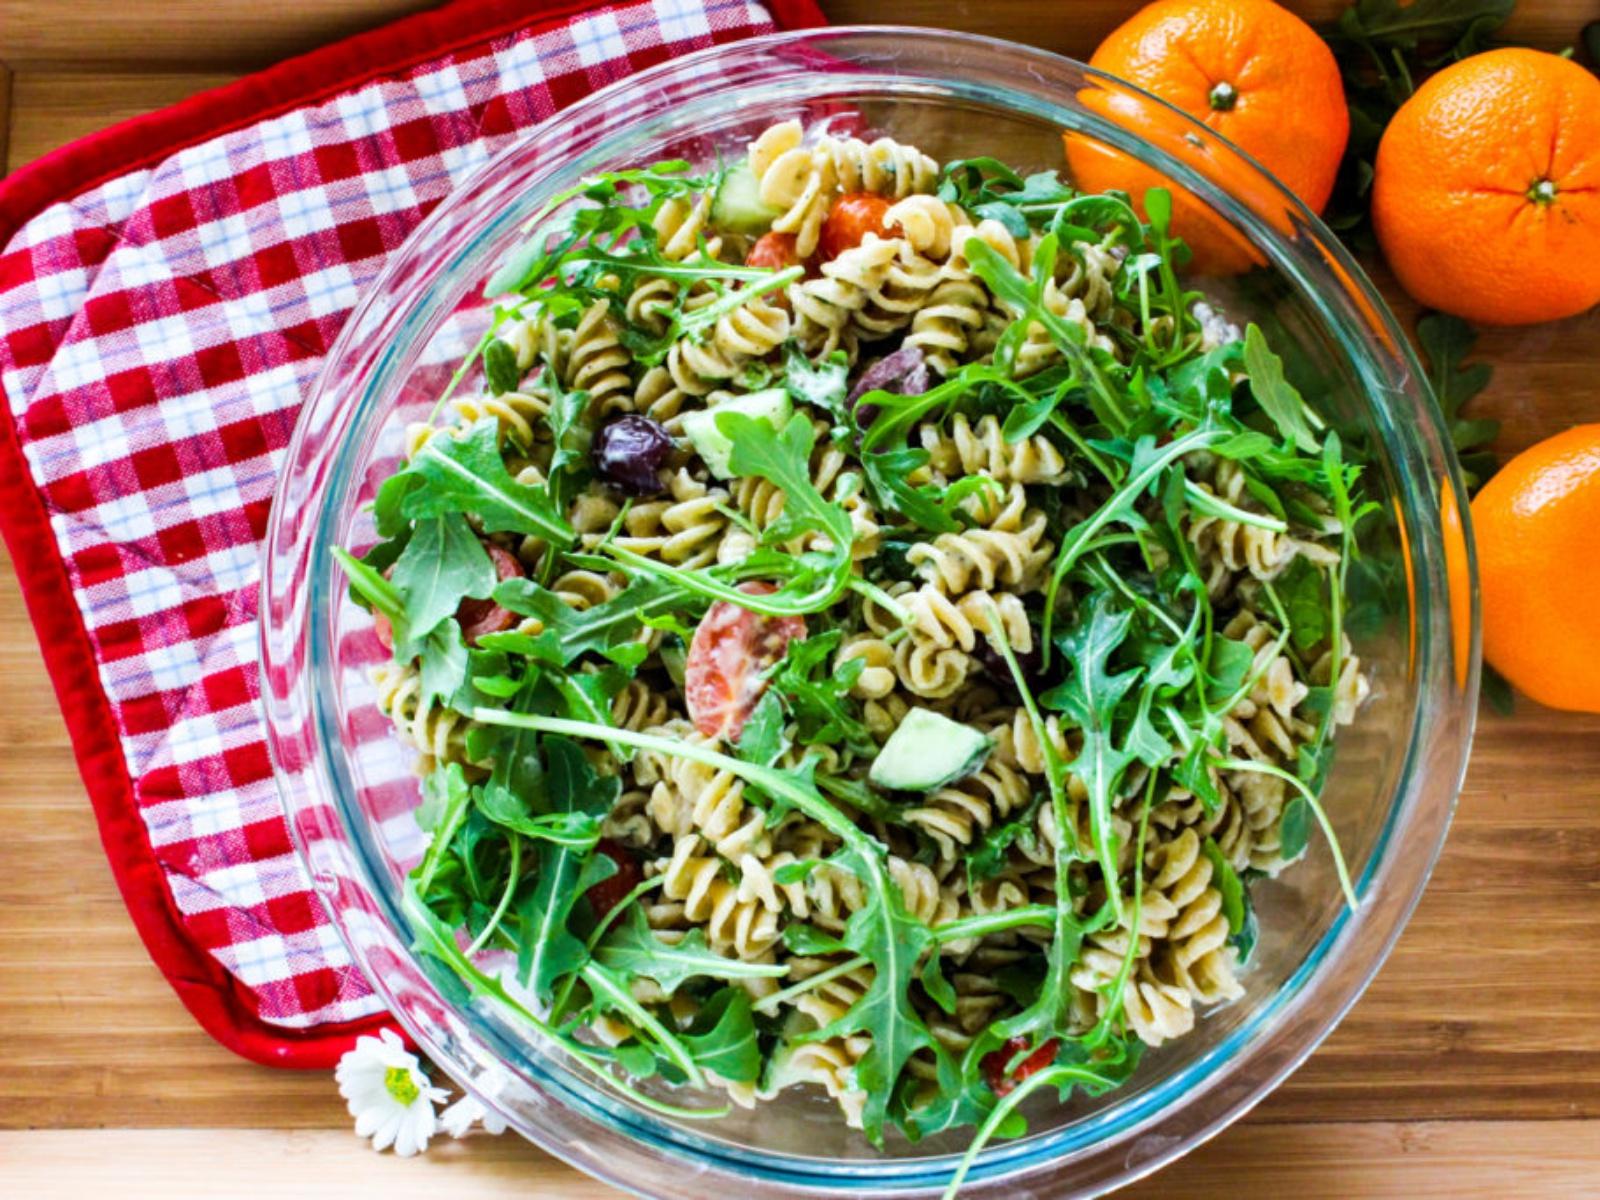 Vegan Creamy Arugula Pasta Salad